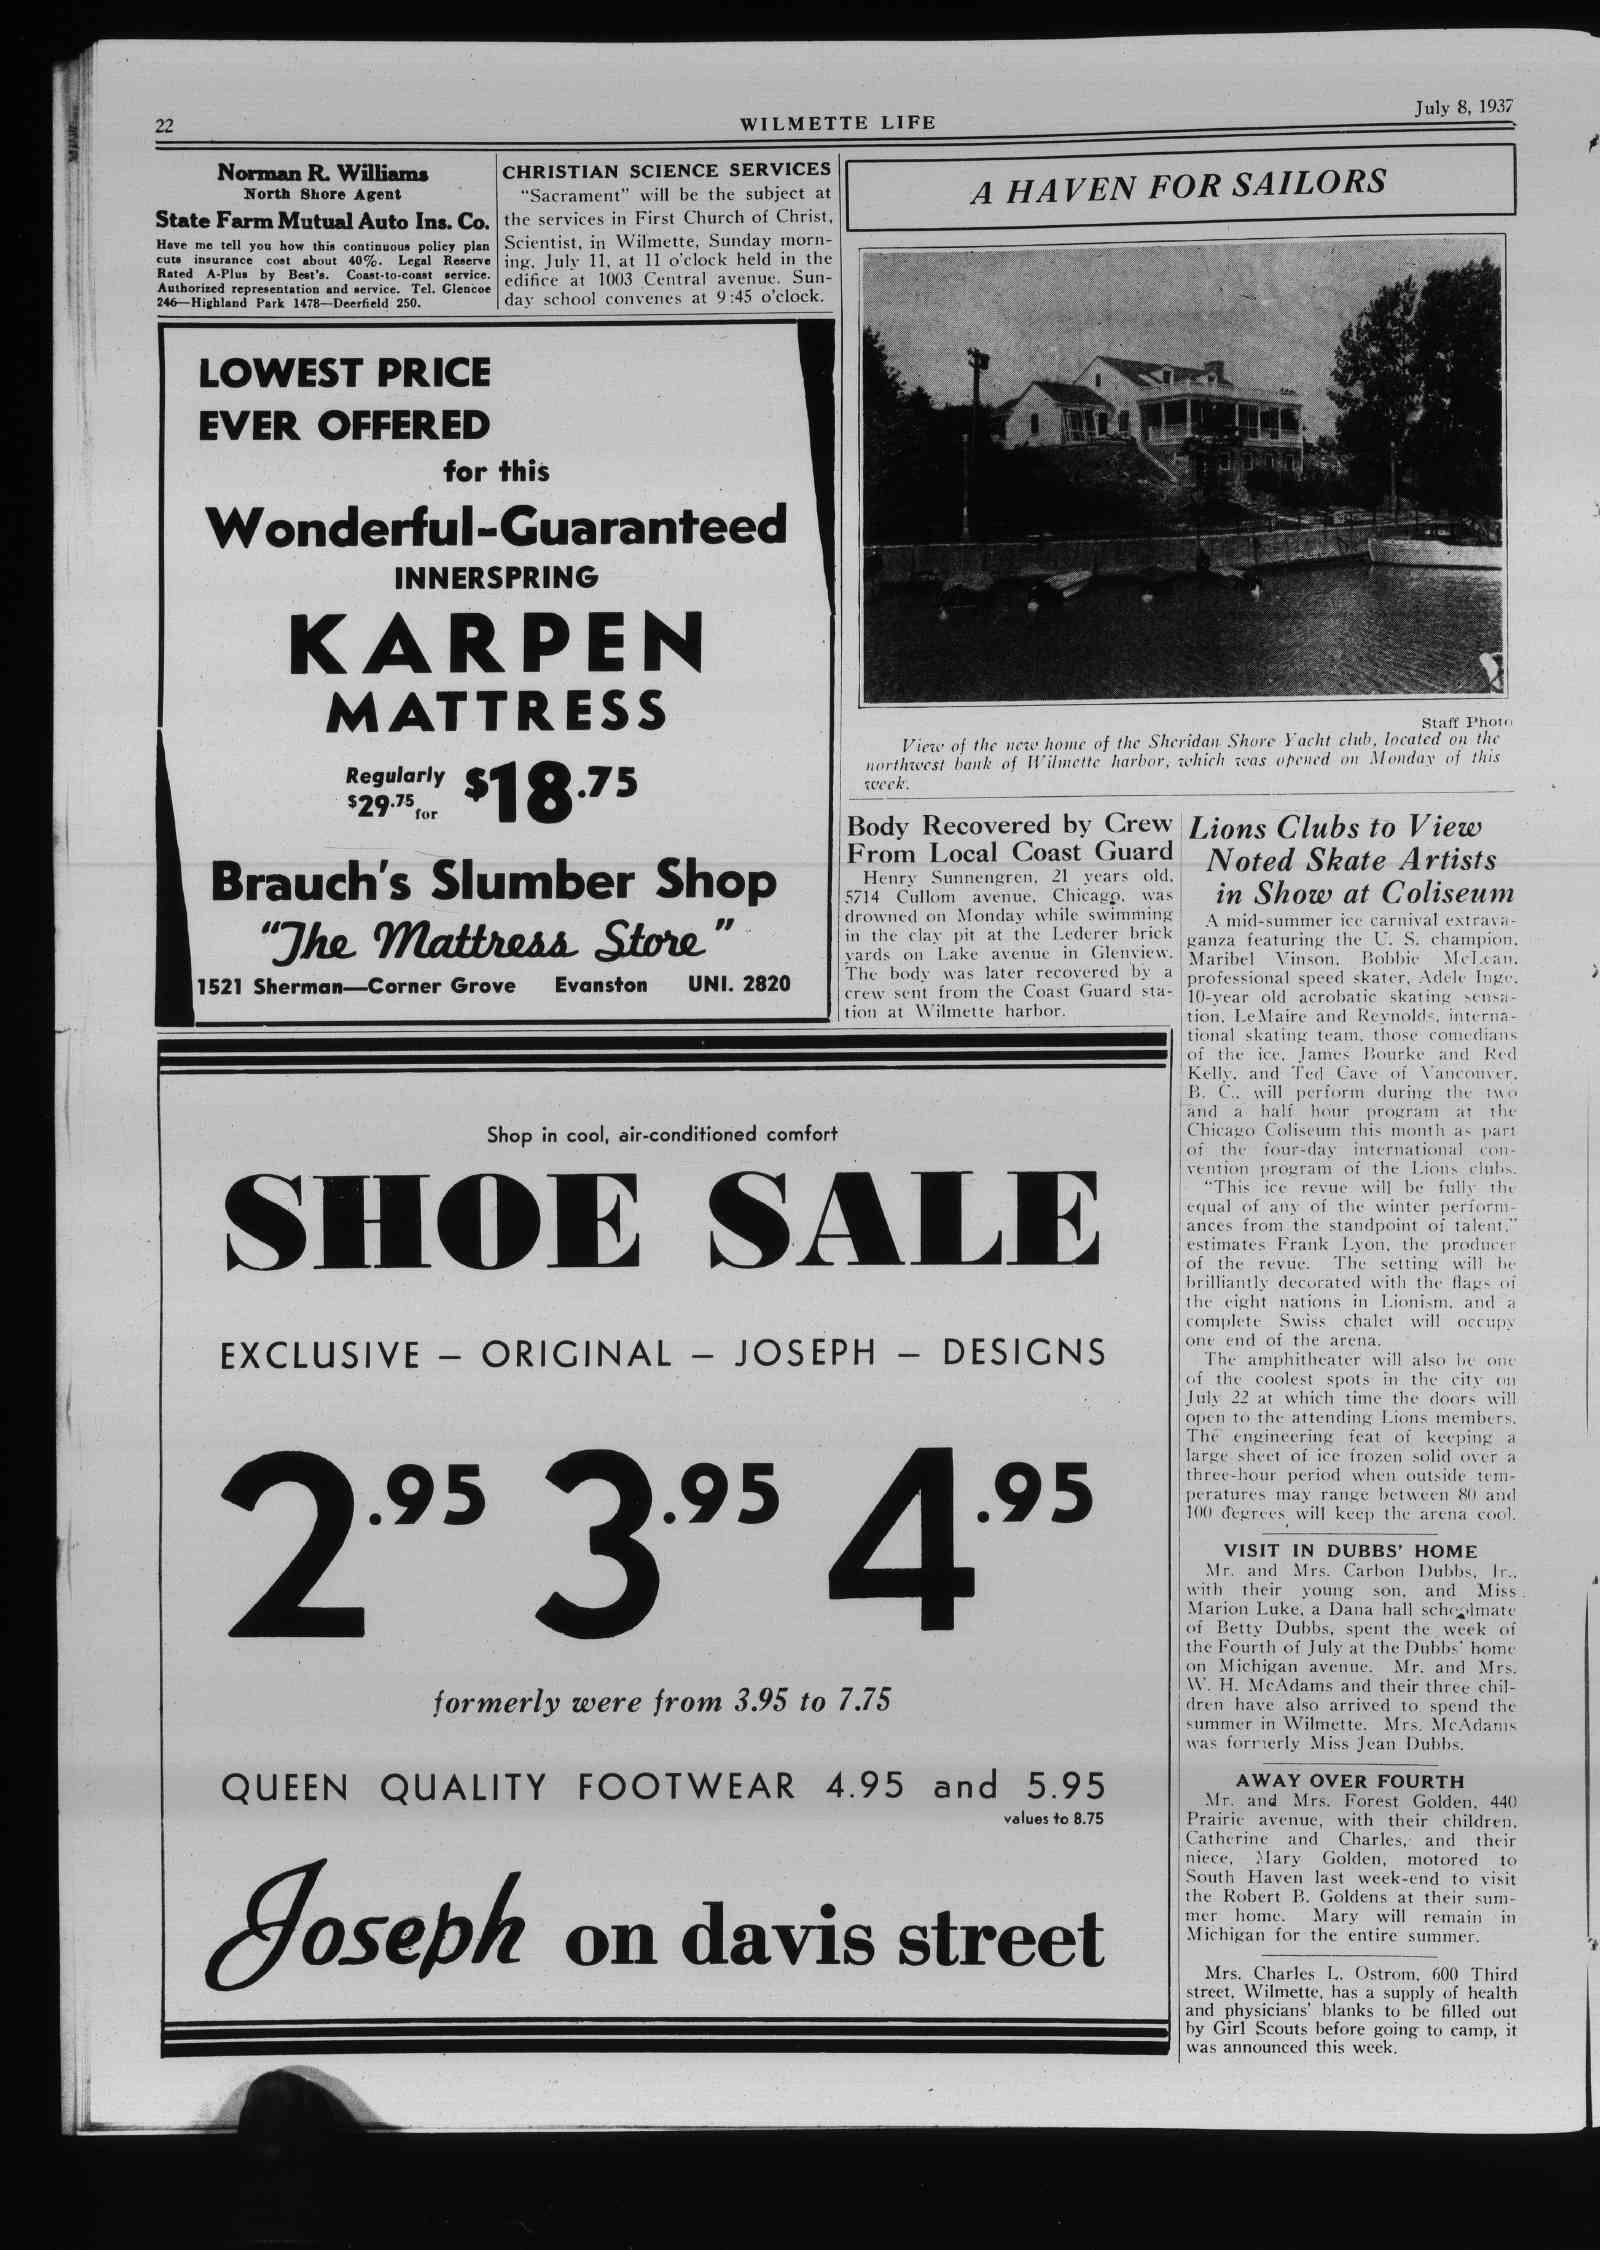 Wilmette Life (Wilmette, Illinois), 8 Jul 1937